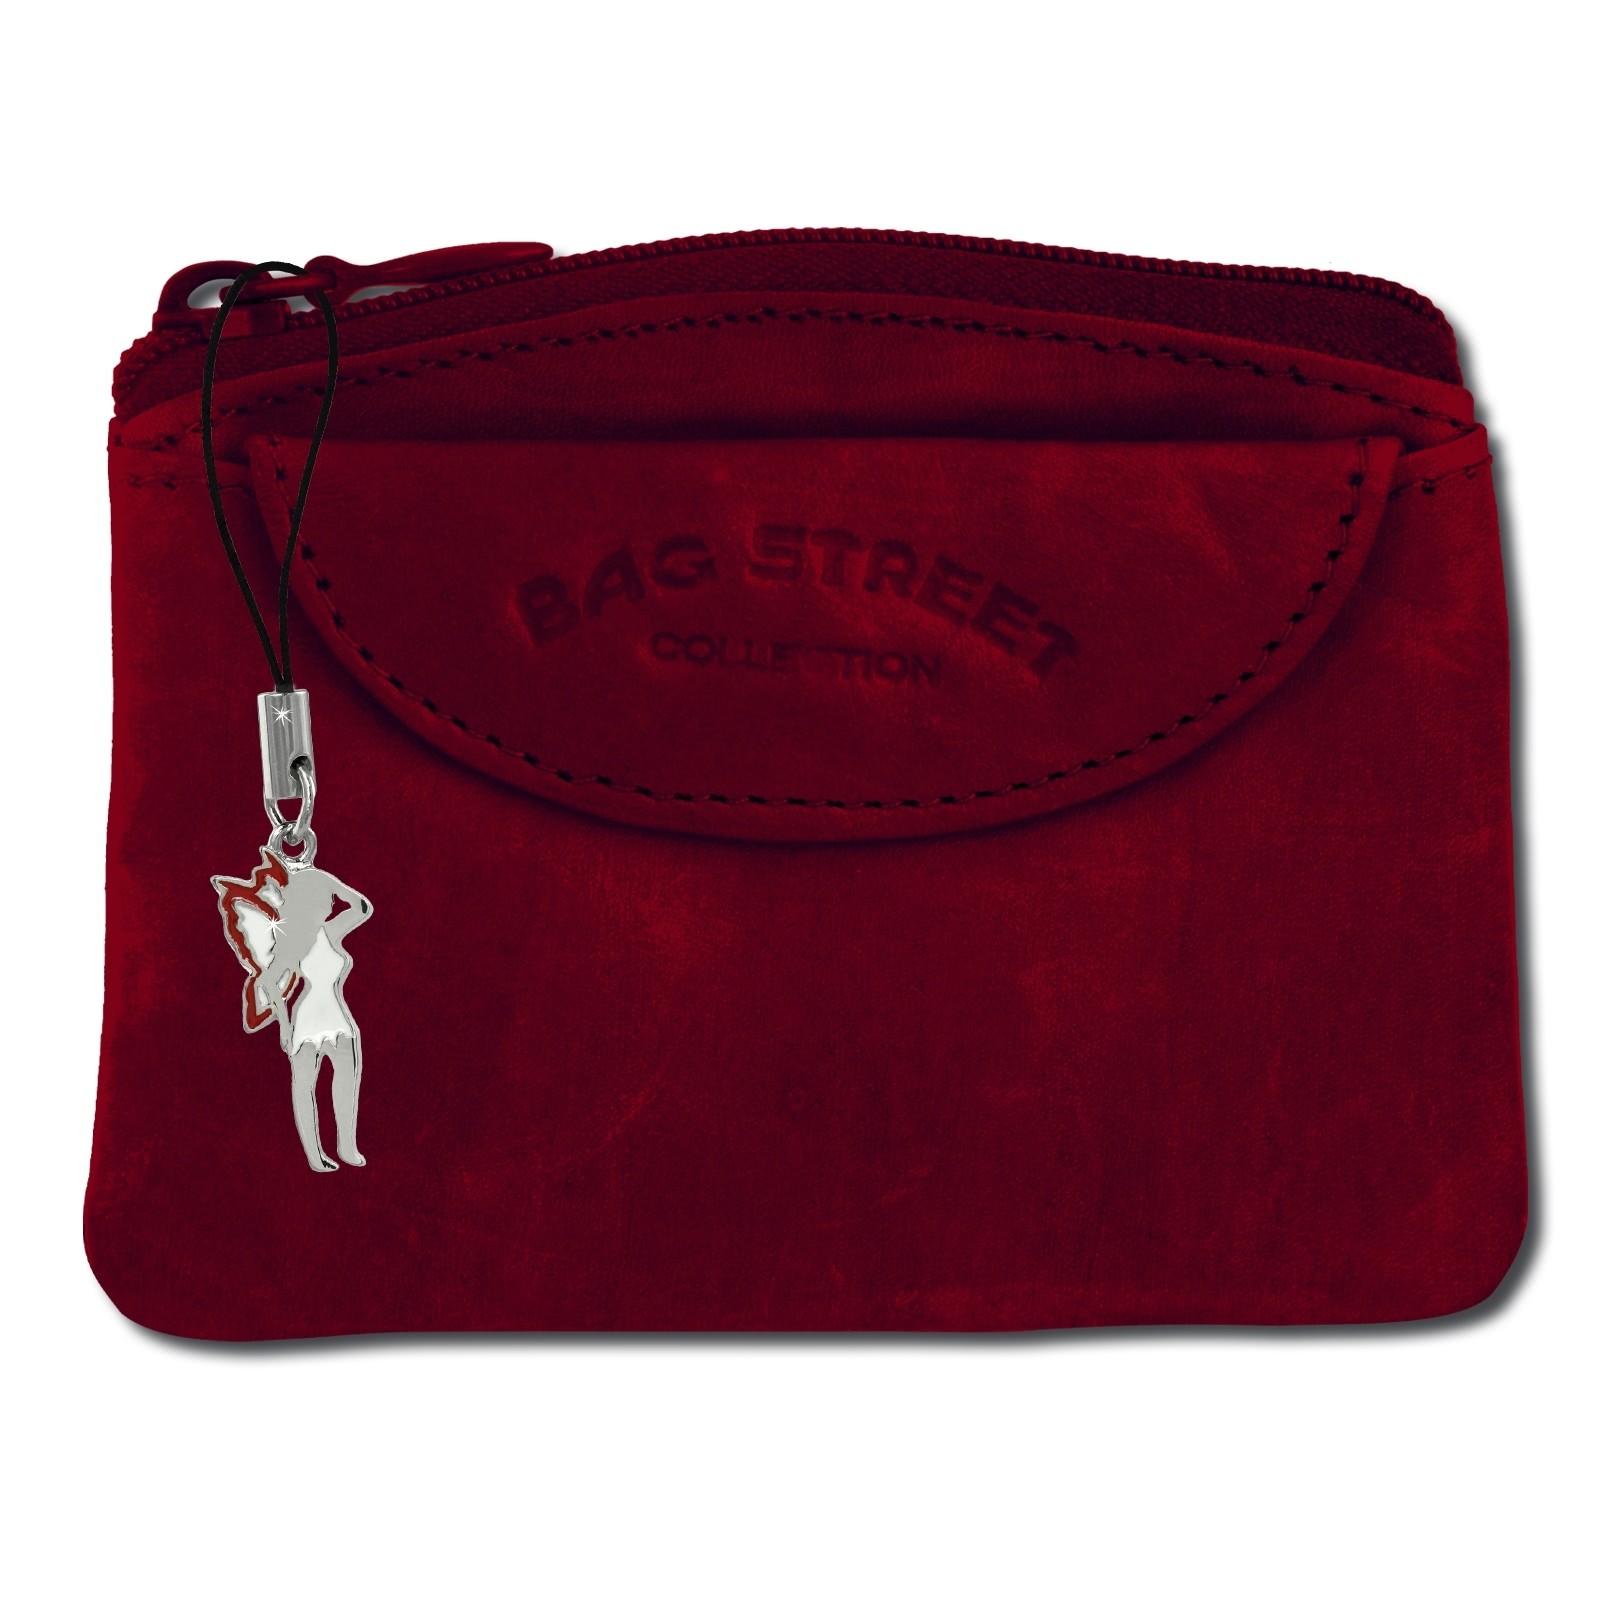 SilberDream Schlüsseltasche rot Echtleder, glattes Leder Etui OPJ901R